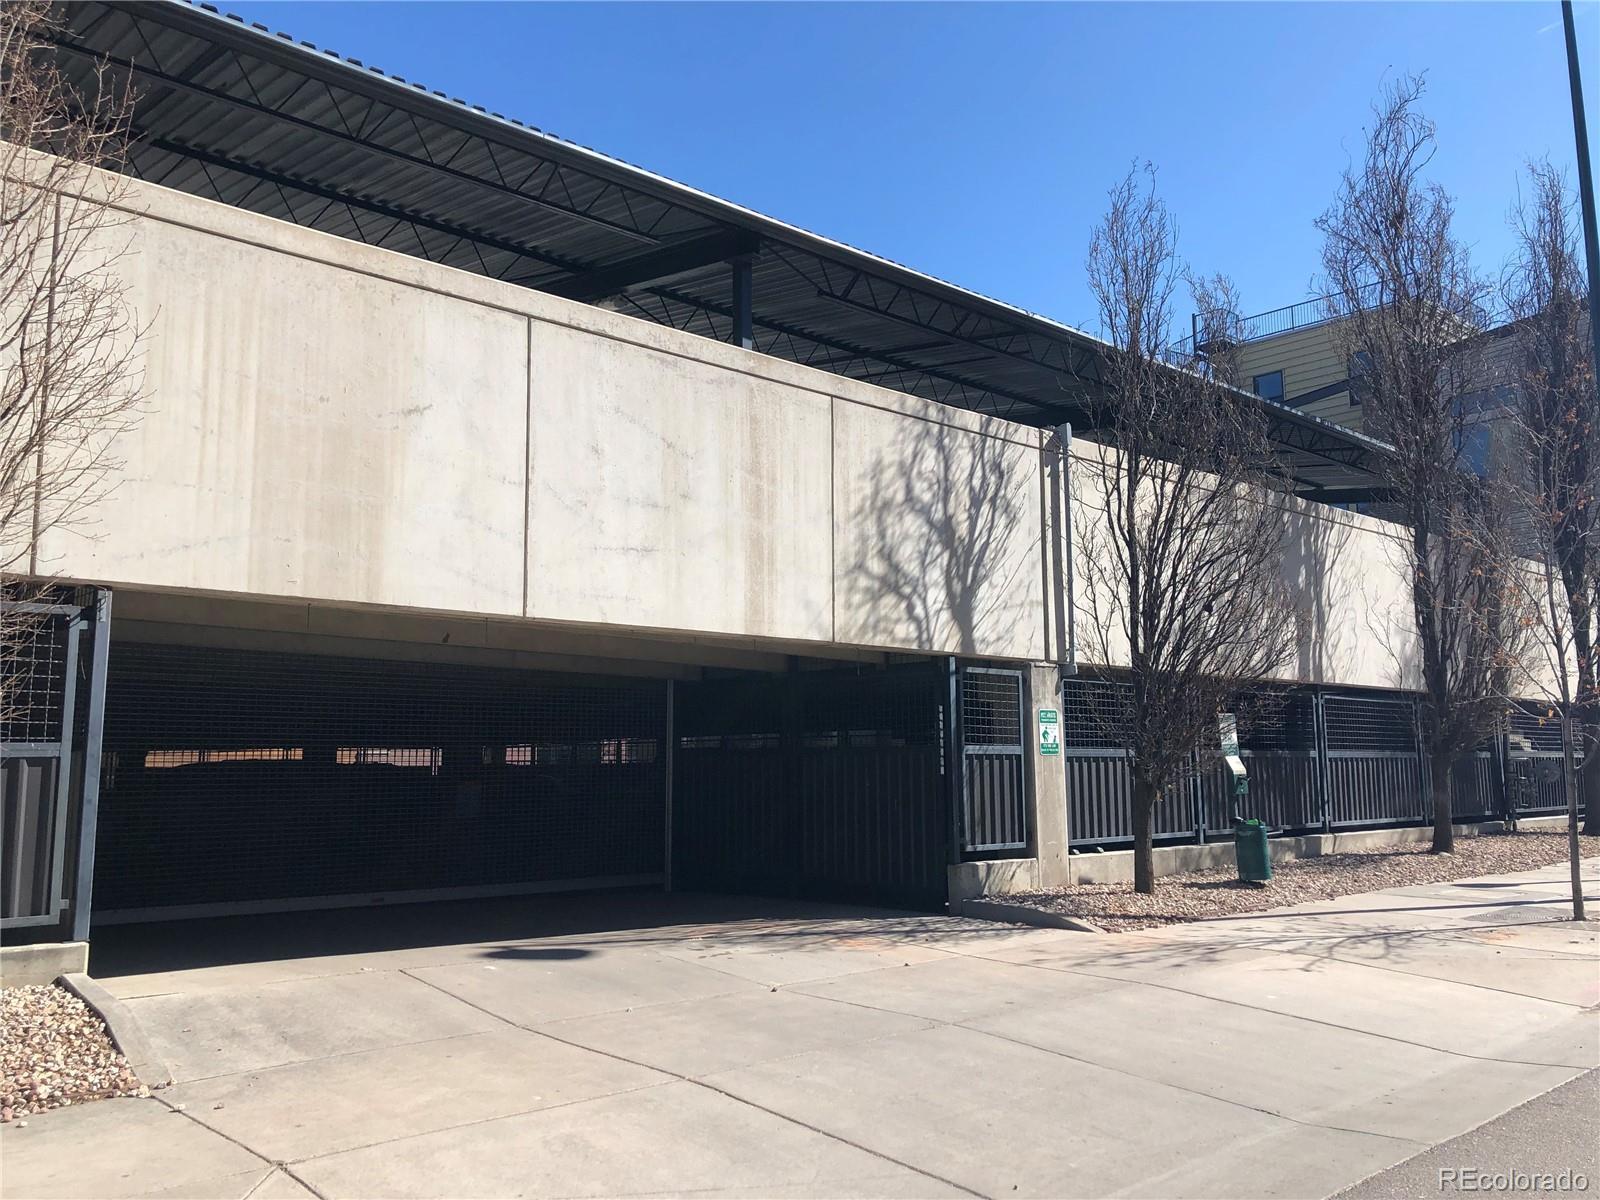 MLS# 7165162 - 3 - 2960 Inca Street, Denver, CO 80202